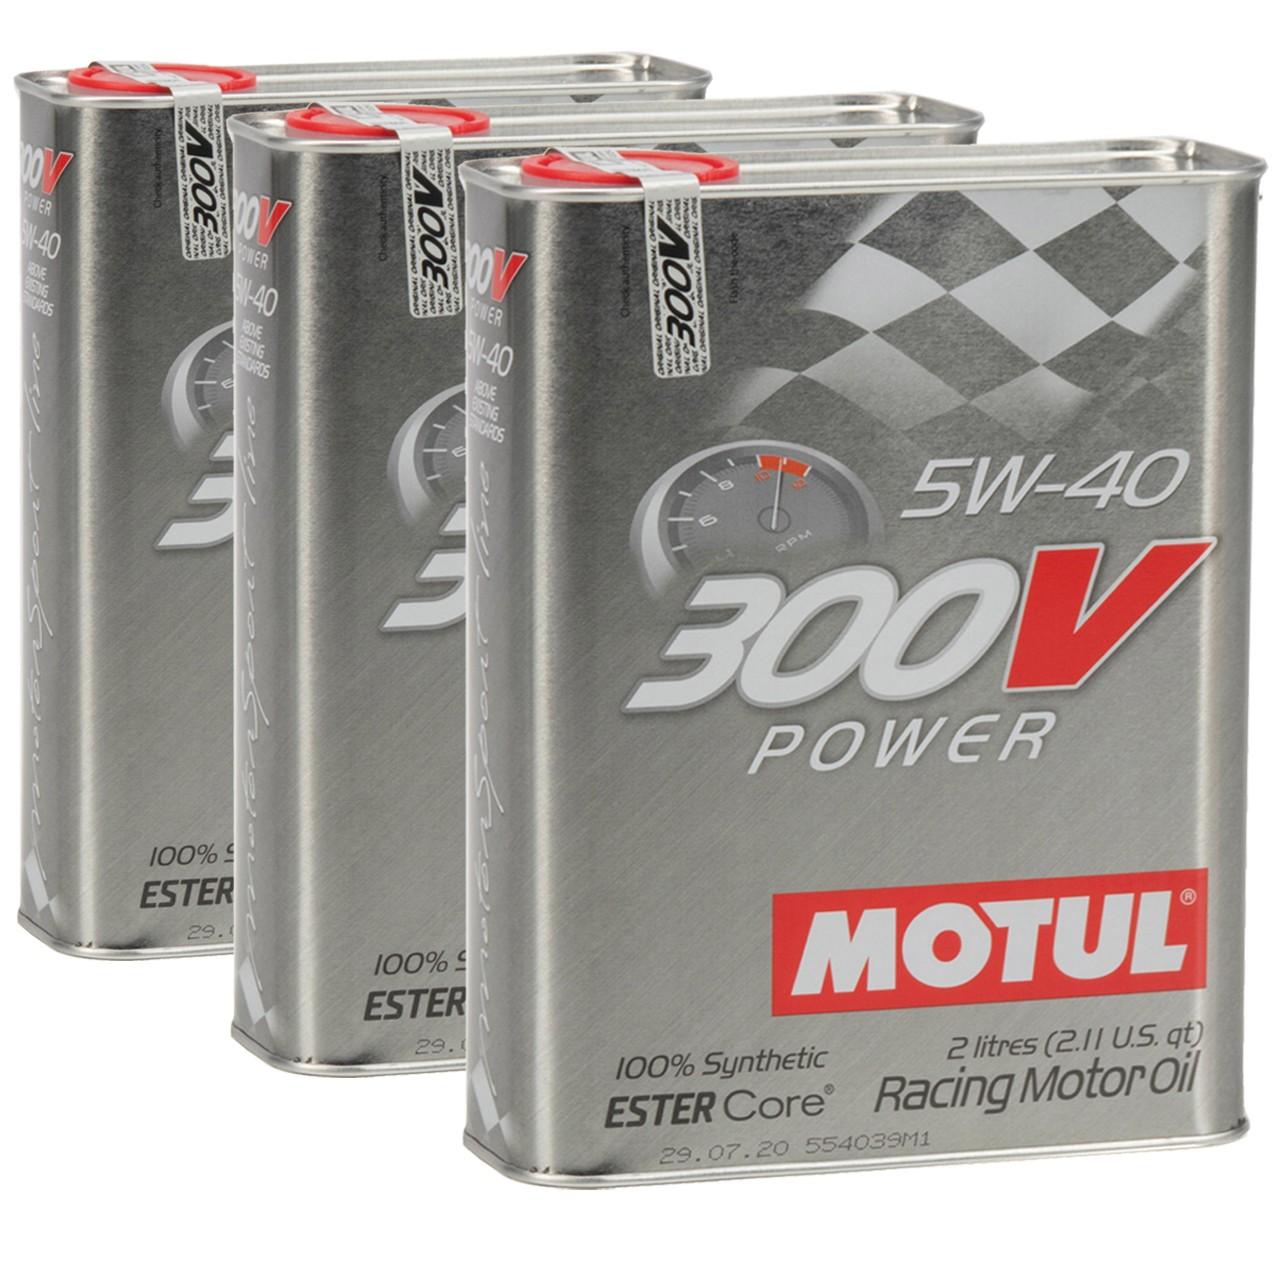 MOTUL 300V POWER RACING Motoröl Öl 5W40 100% Synthetic Ester Core - 6L 6 Liter